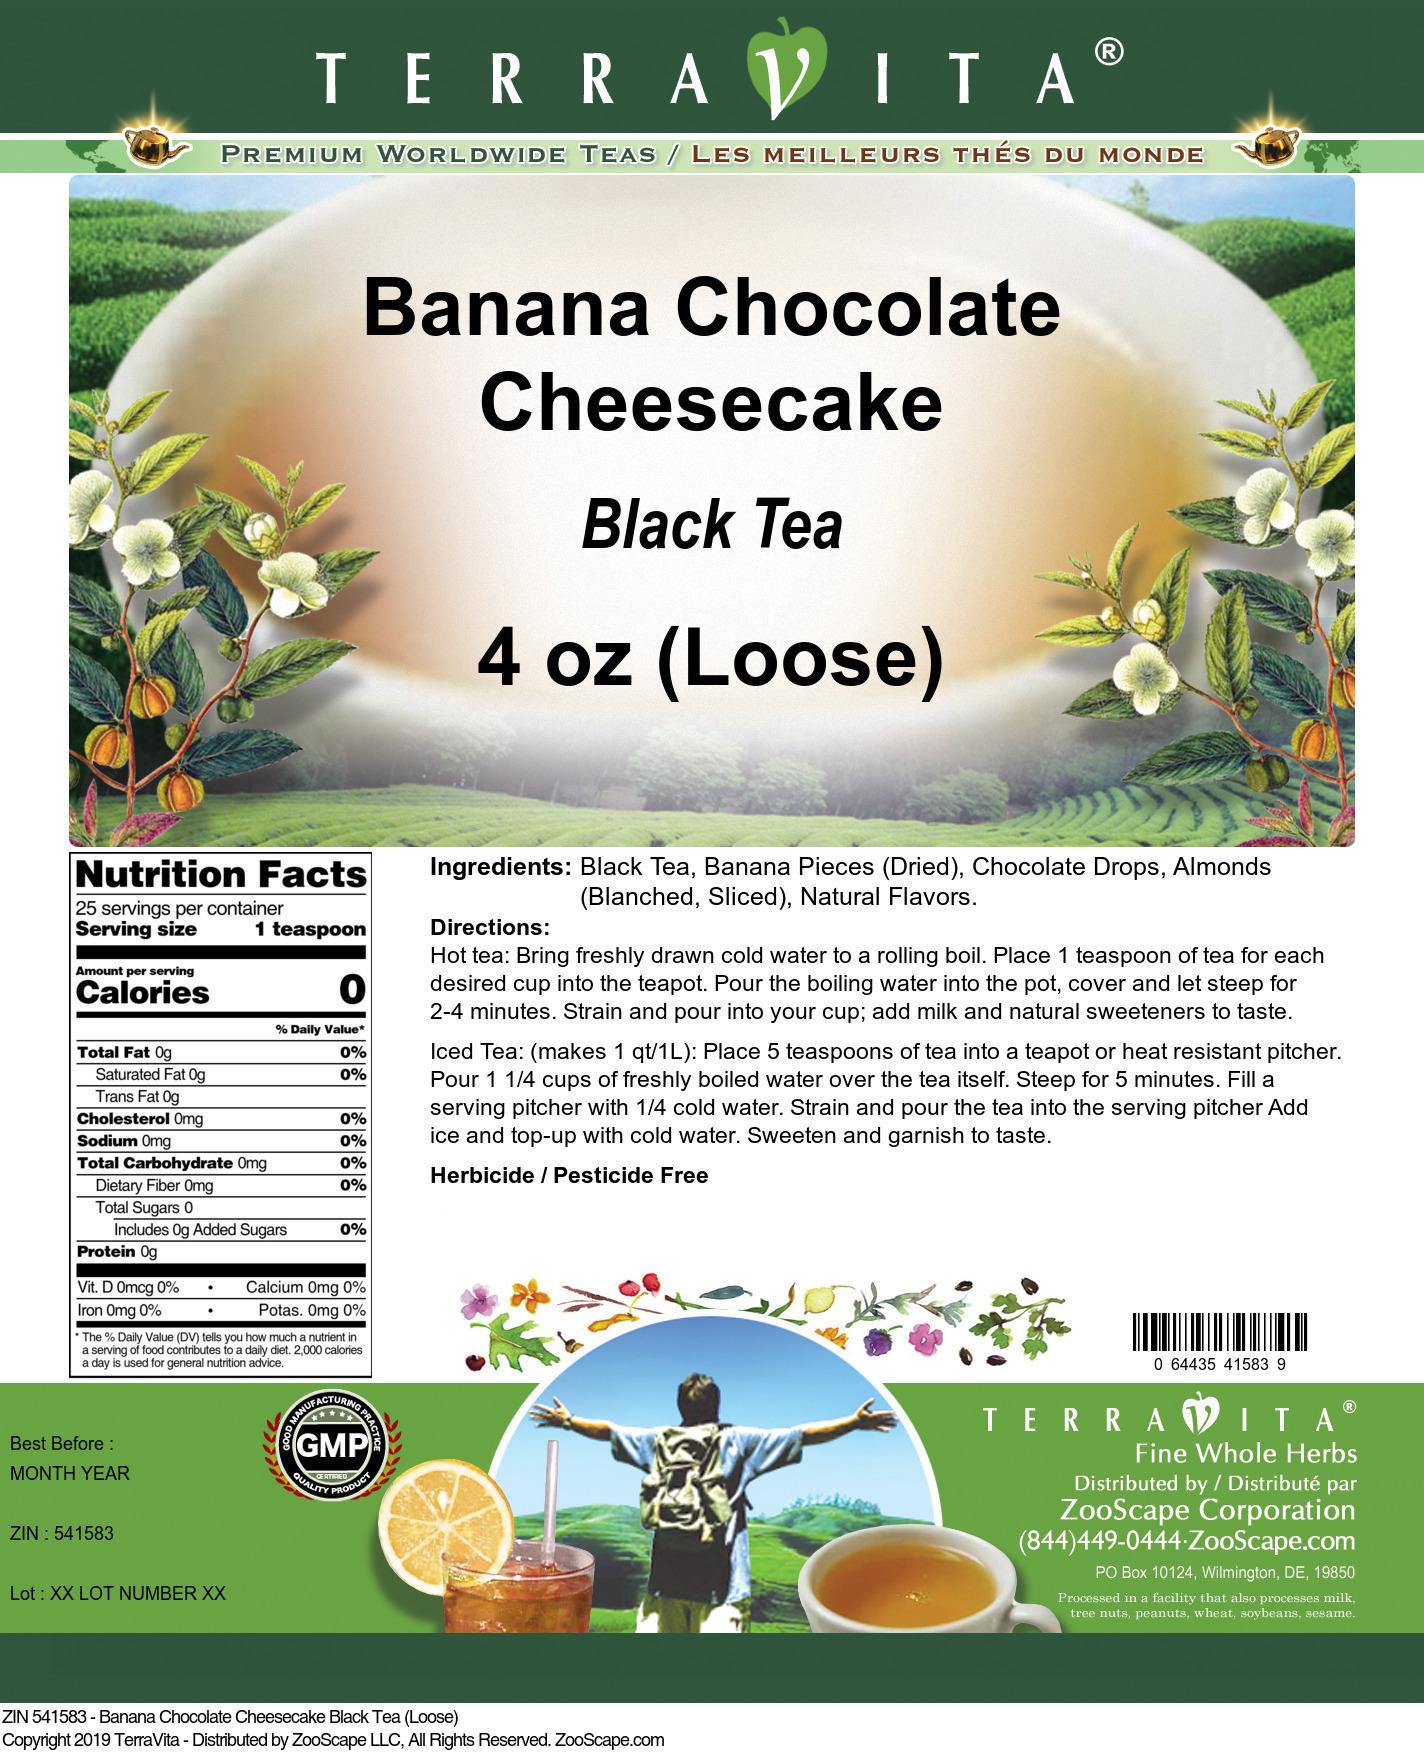 Banana Chocolate Cheesecake Black Tea